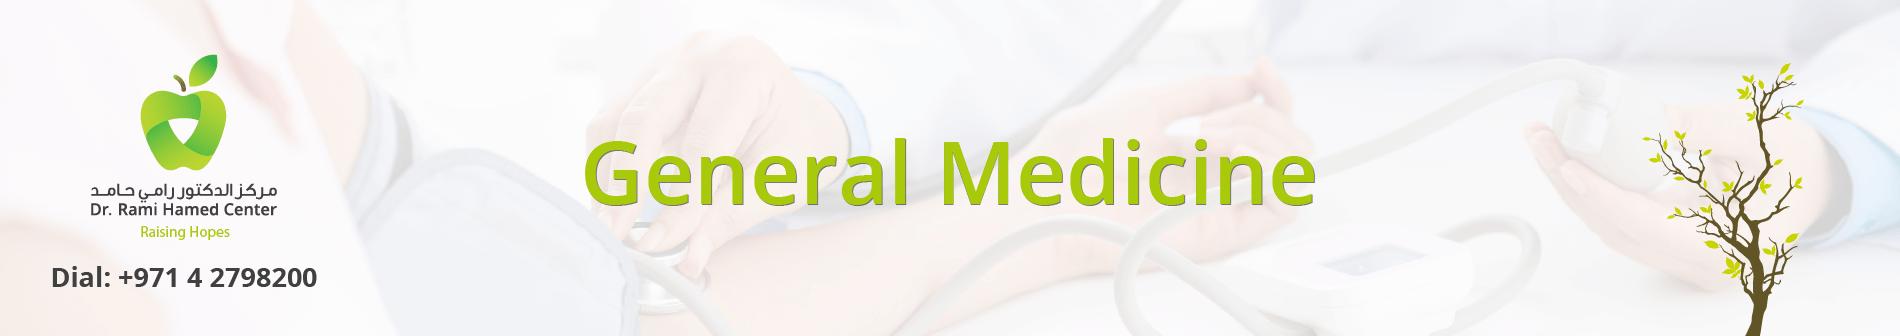 Dubai General Medicine Clinic